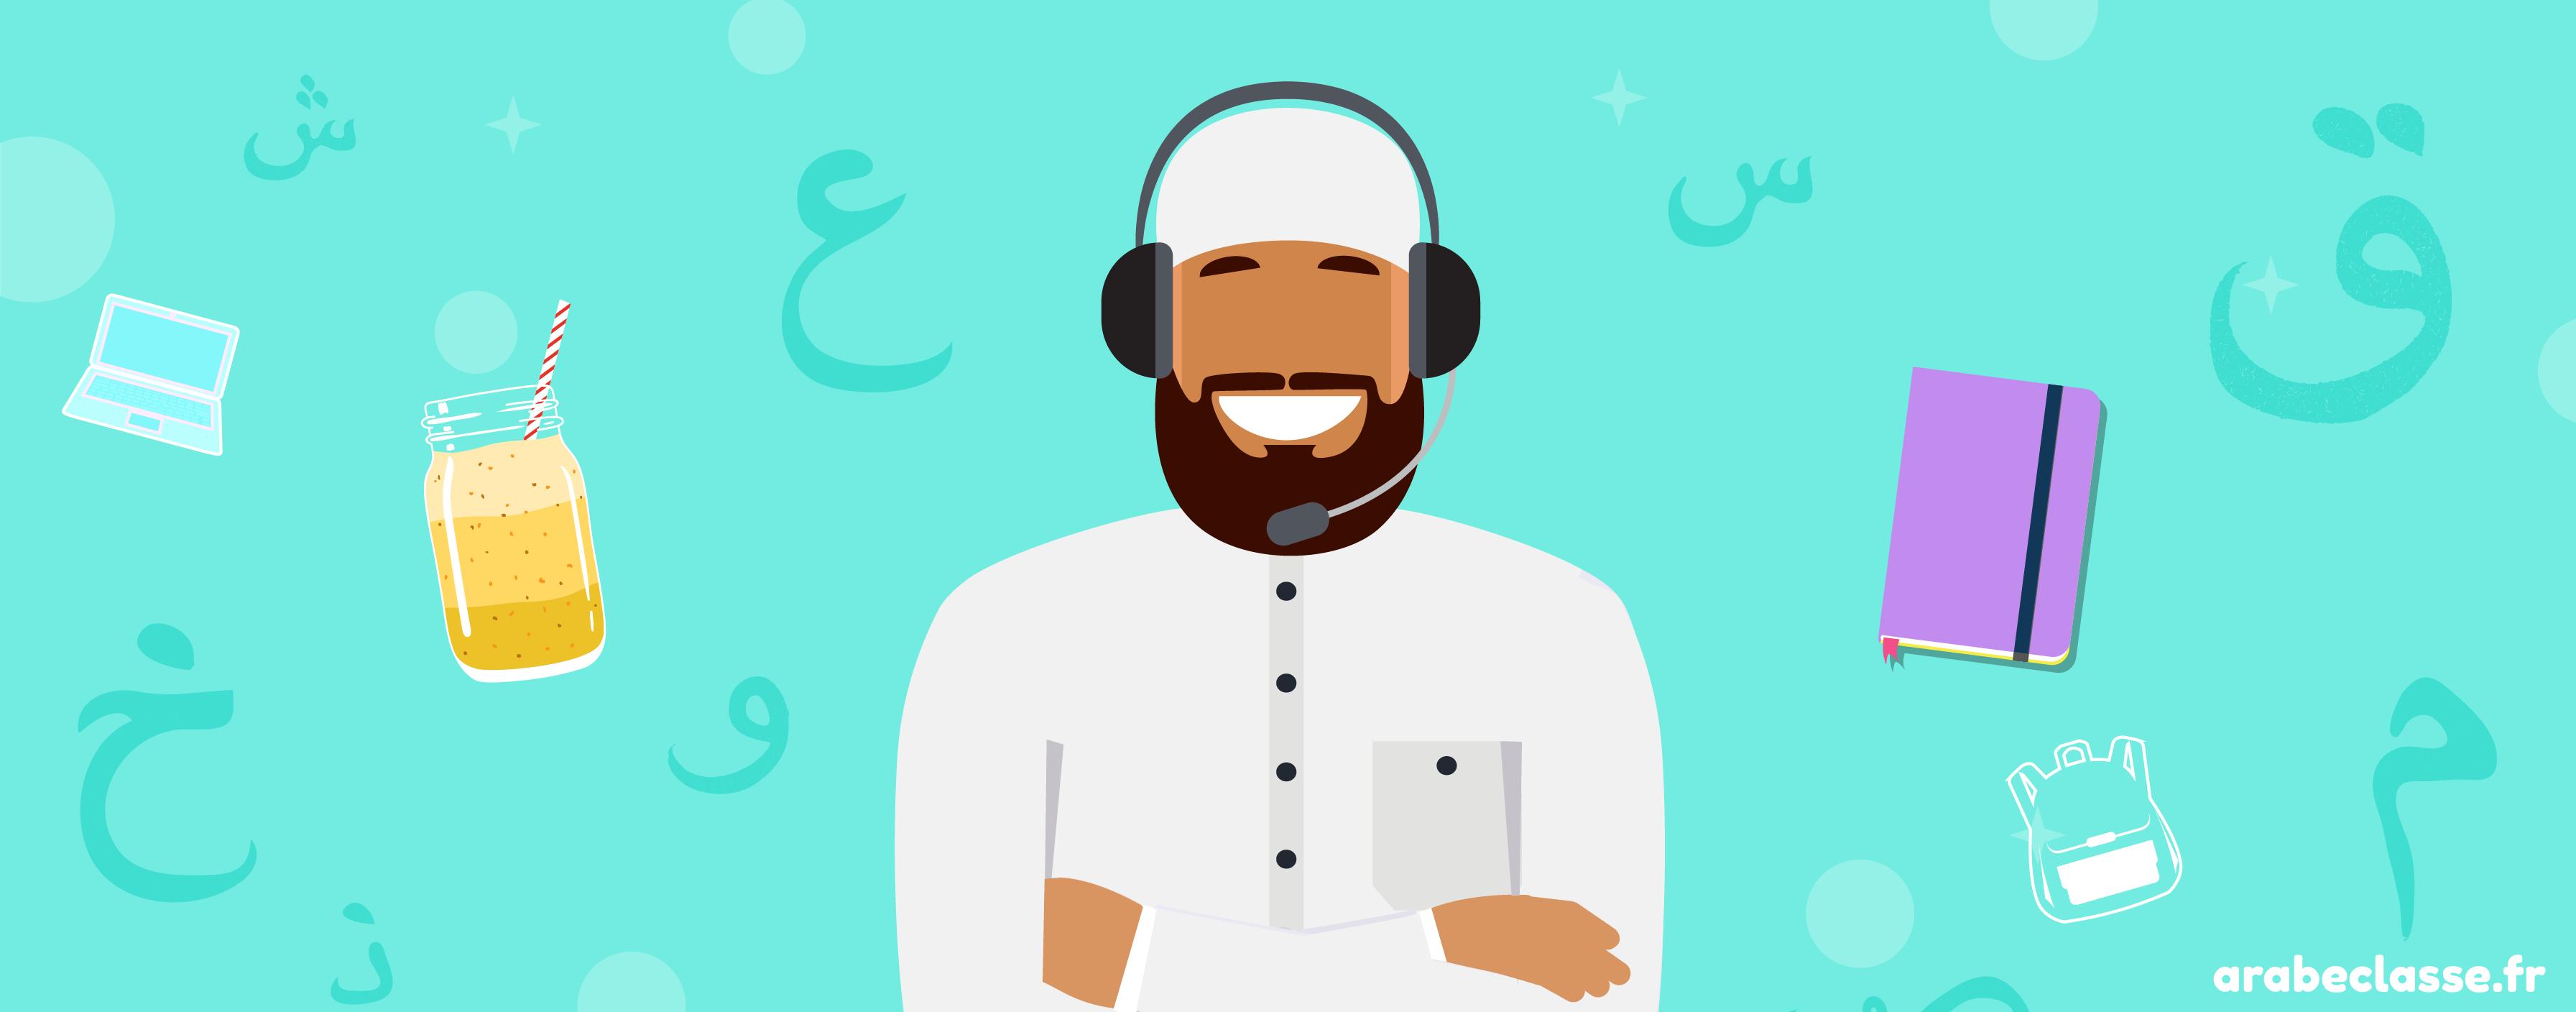 cours arabe en ligne